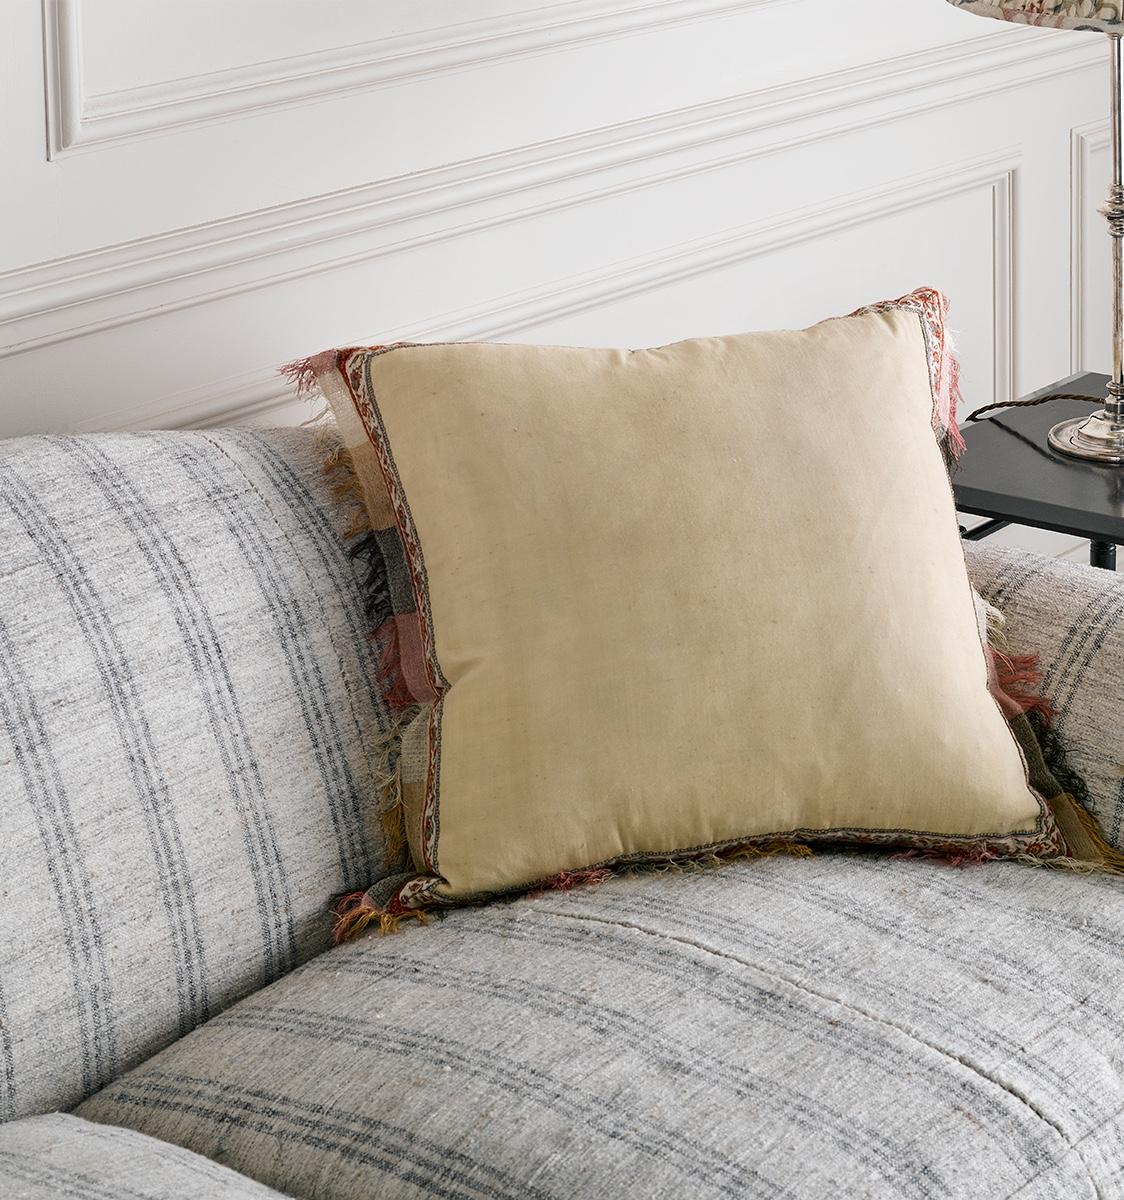 Antique Fabric Cushion with coloured Fringe